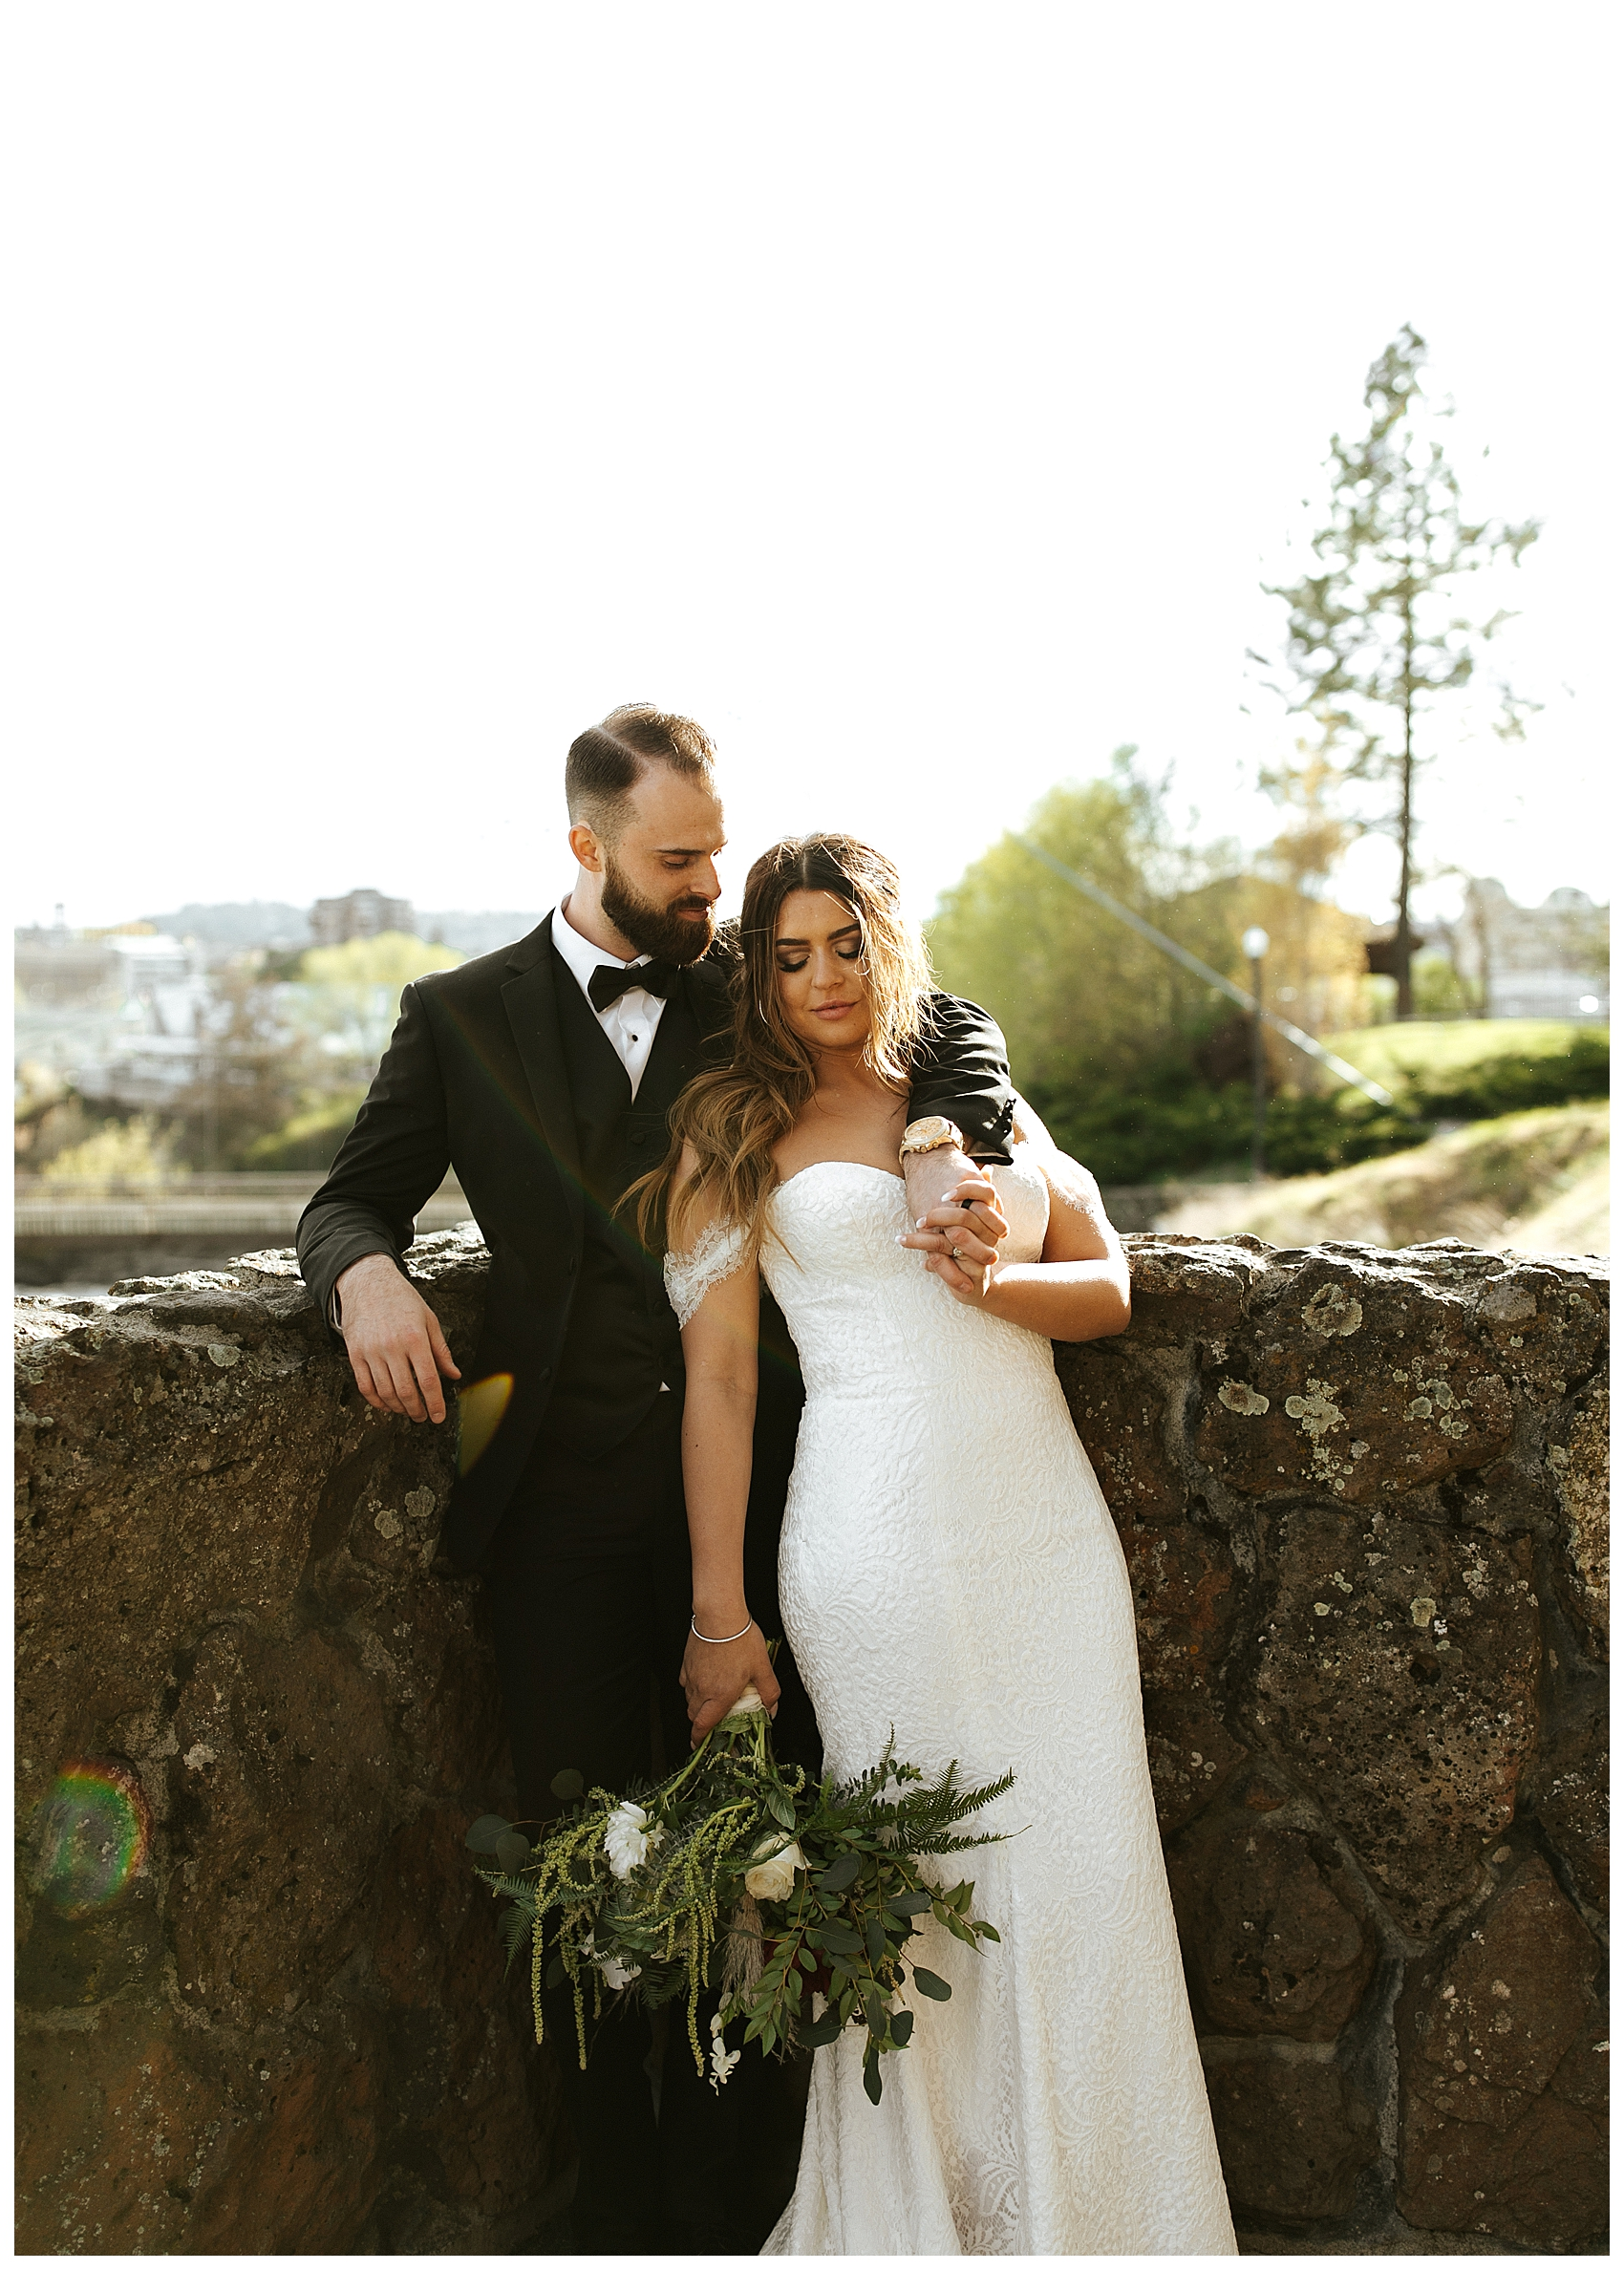 Chateau Rive Spokane Wedding Cassie Trottier Photography01091.jpg